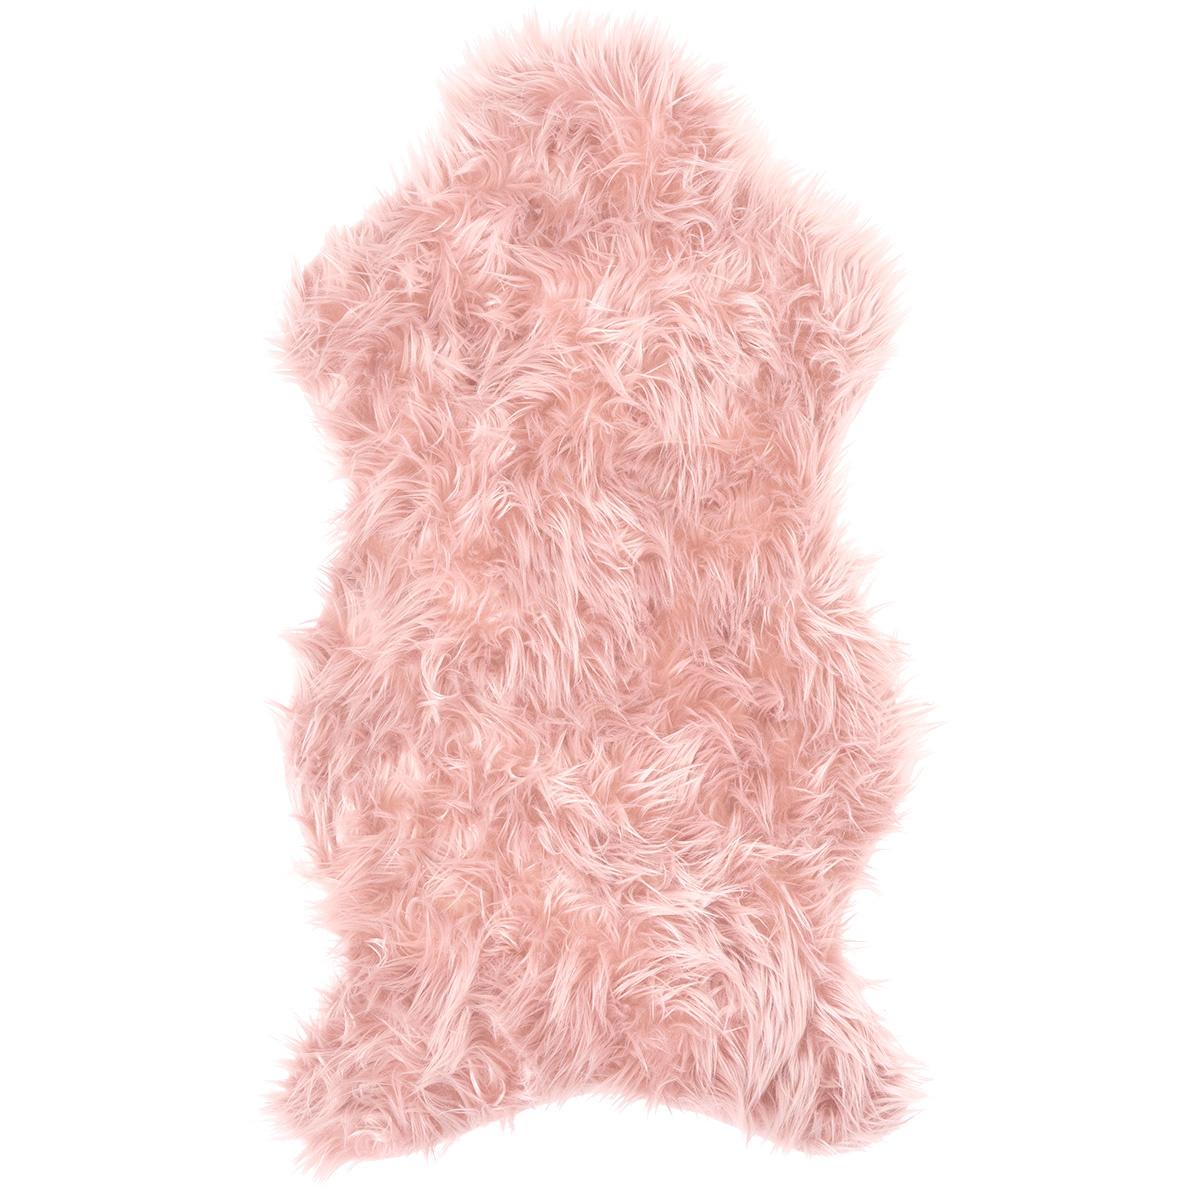 Koopman Kožušina ružová, 50 x 90 cm